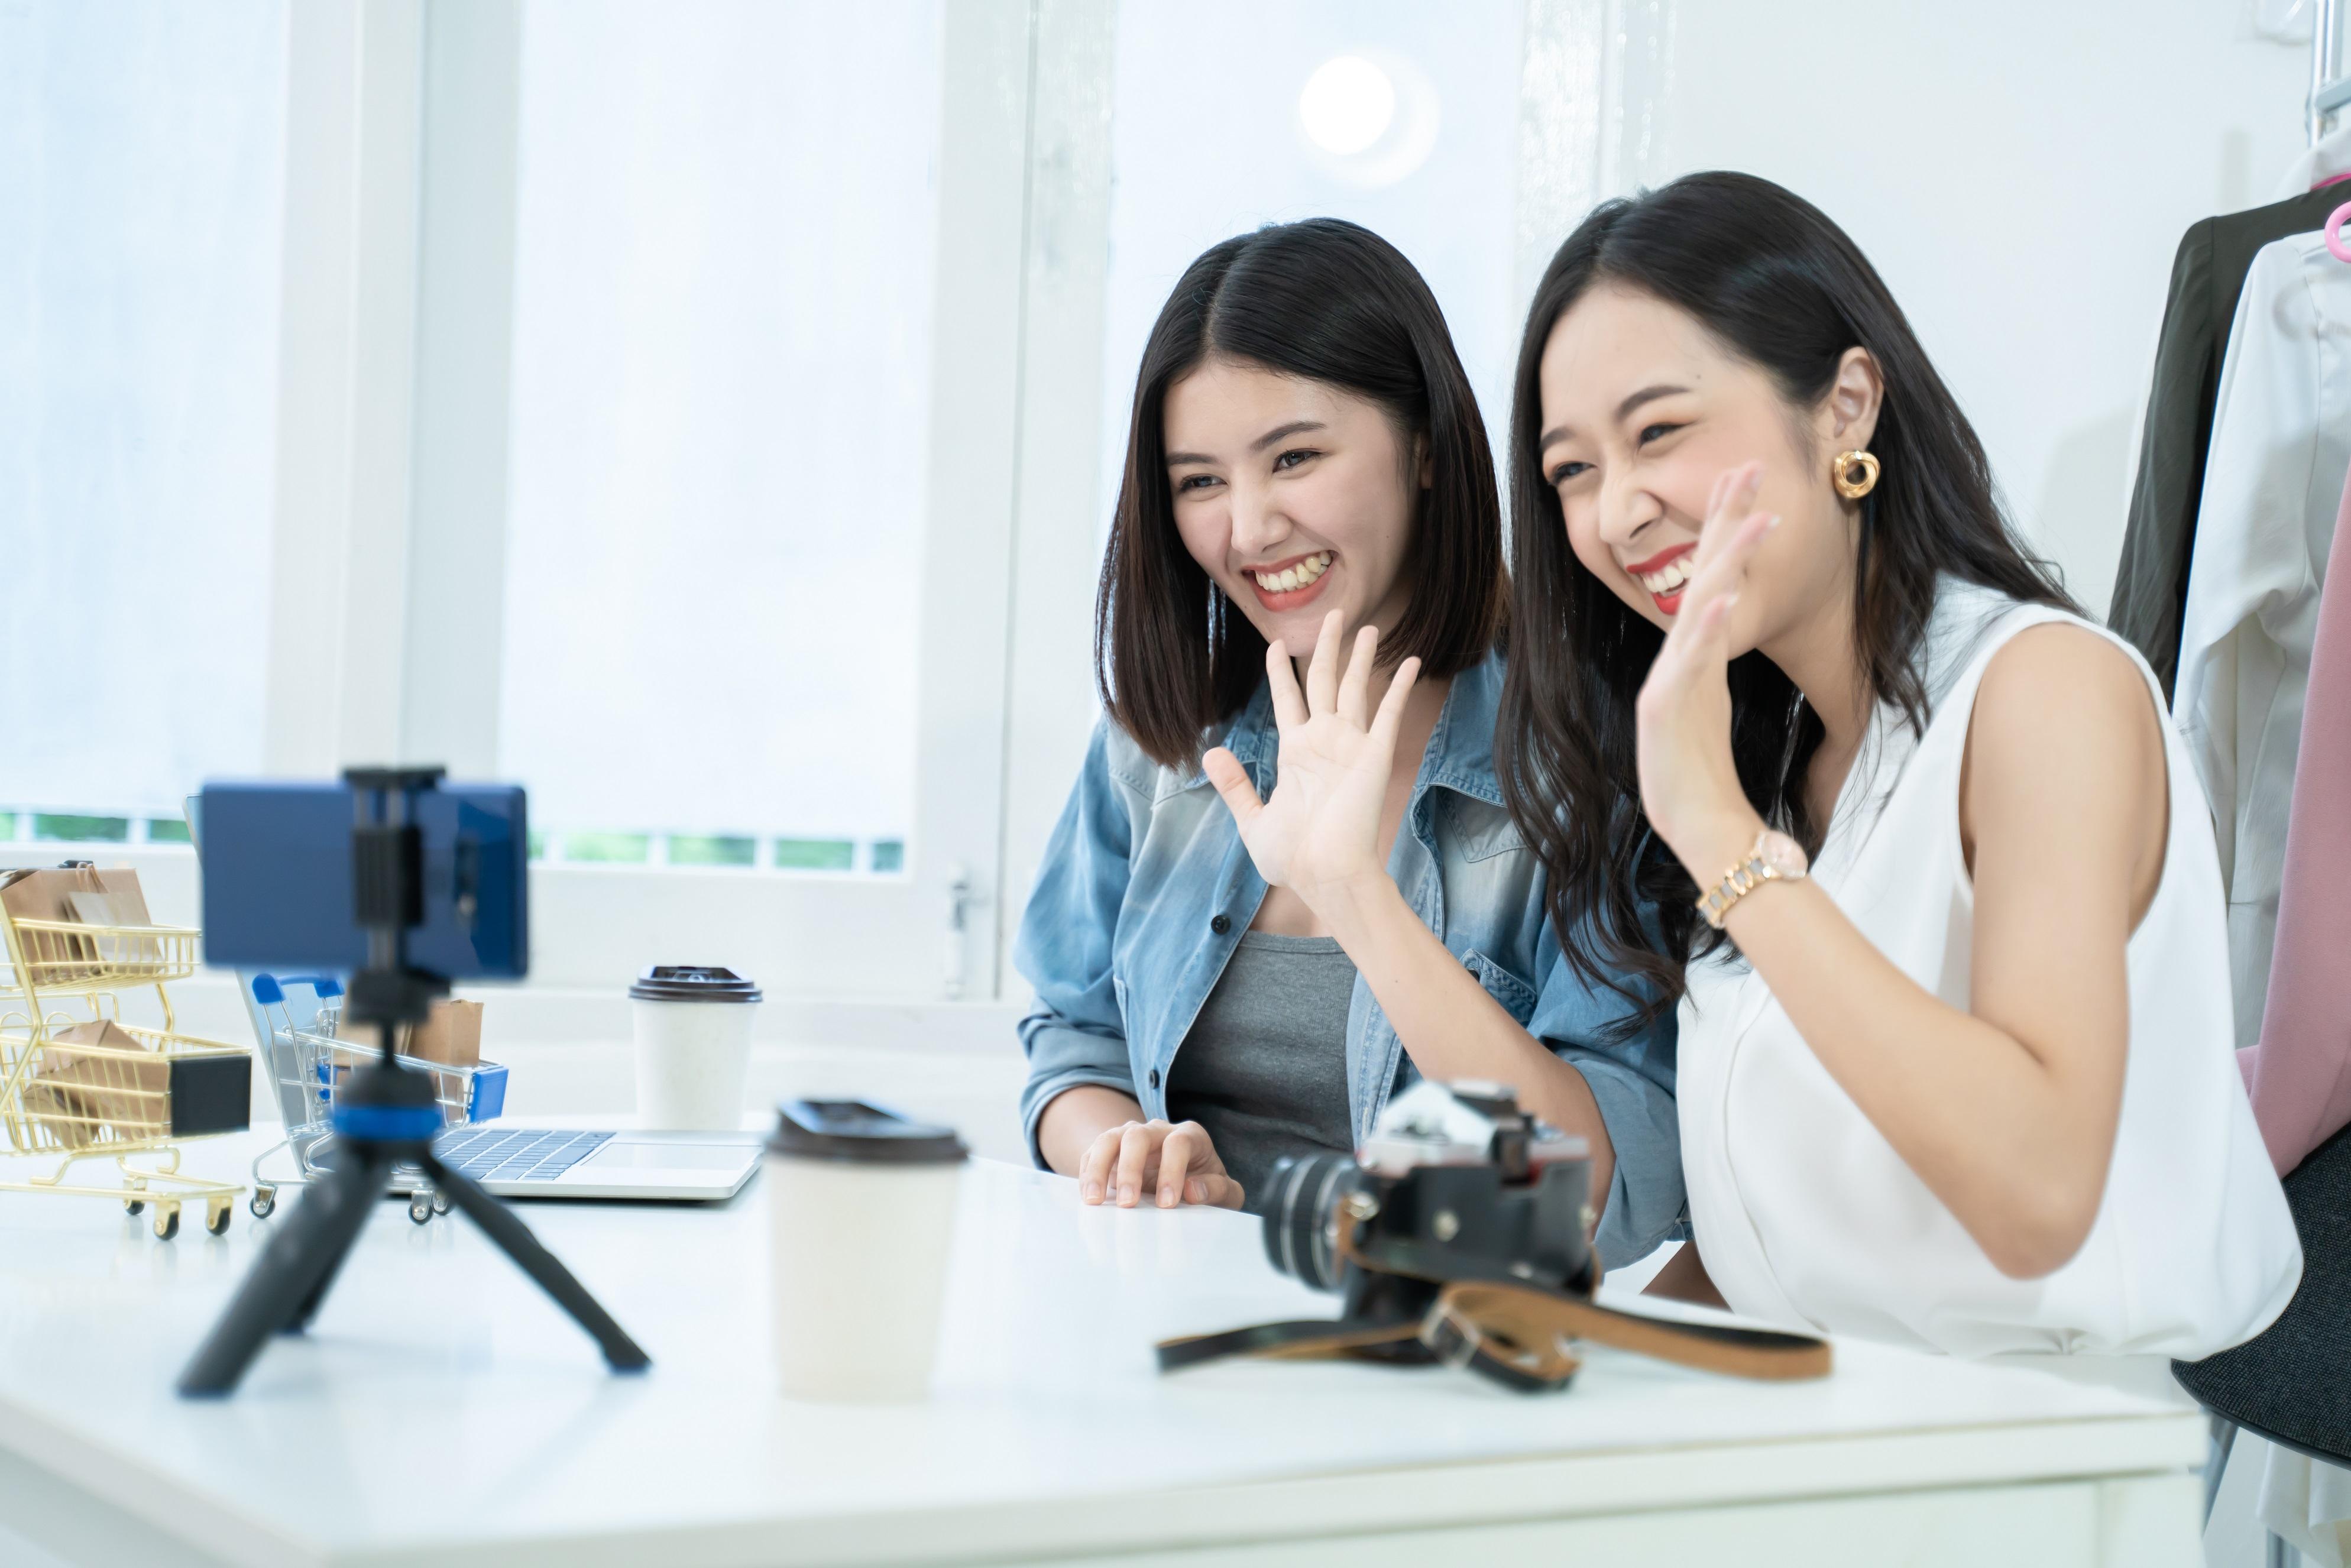 KOLなどは中国消費者の購入行為に影響を与えている